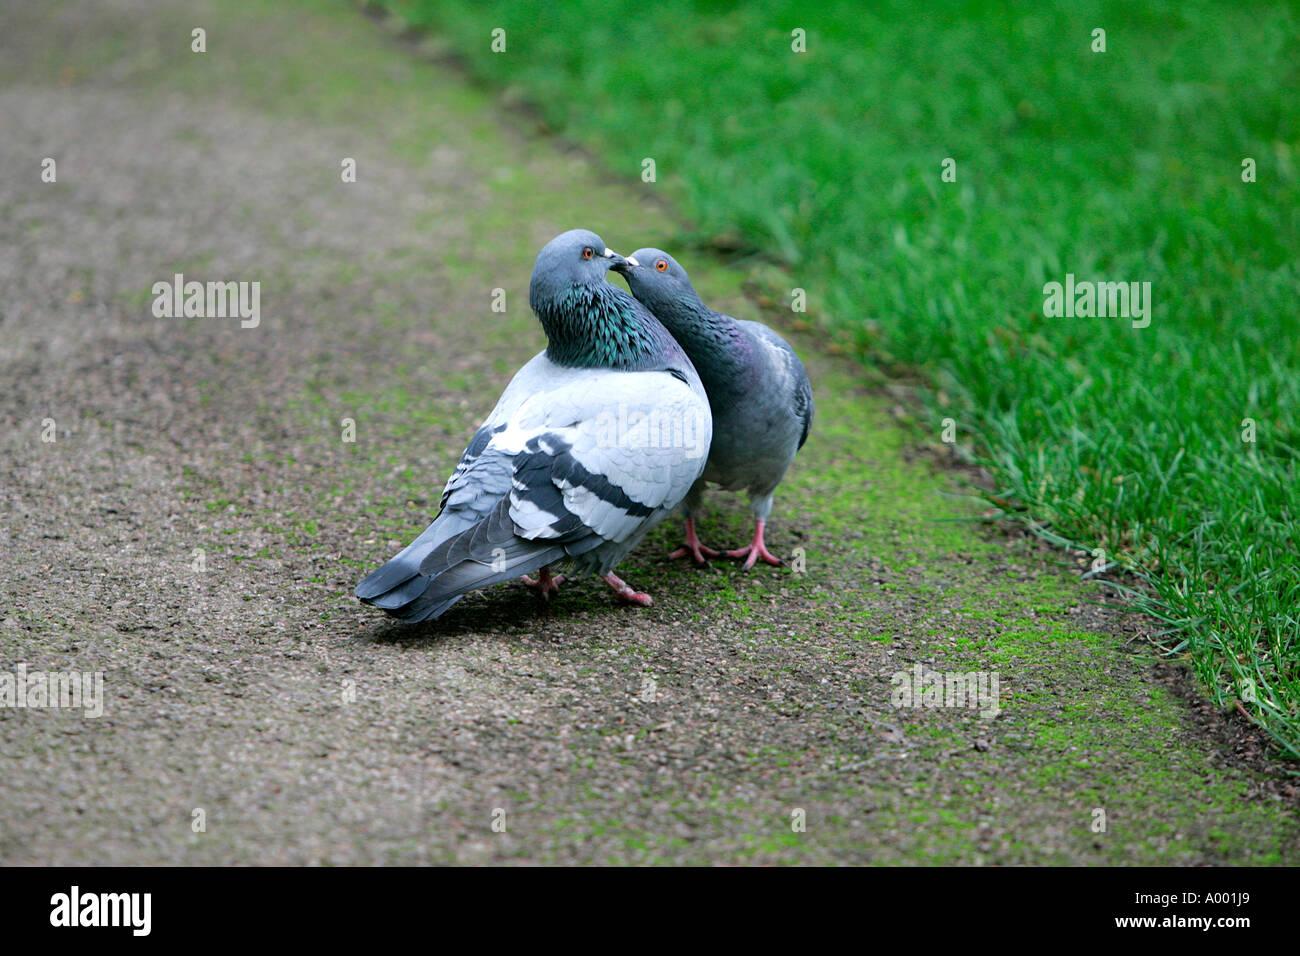 vögeln im freien